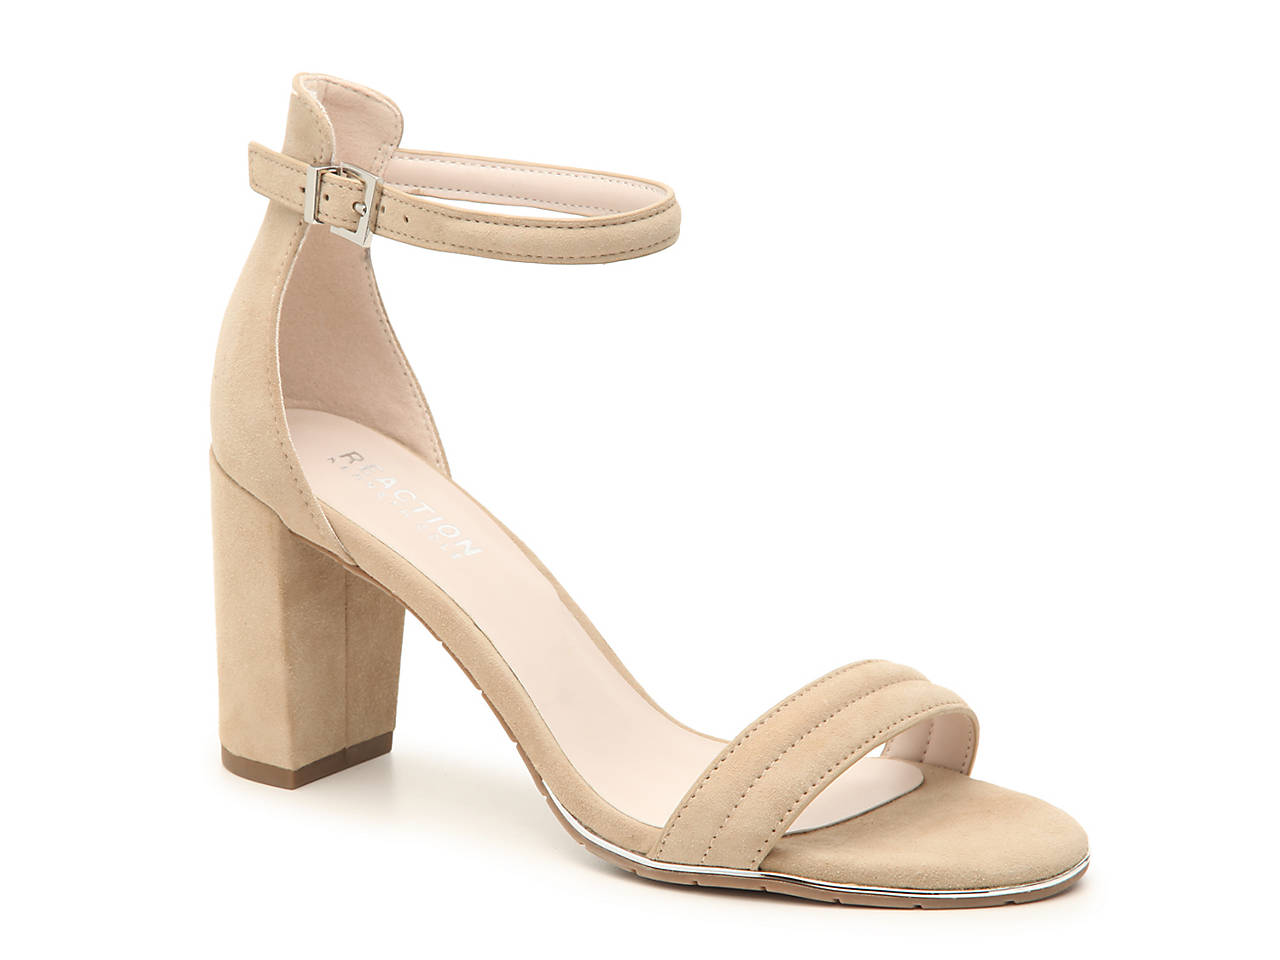 fe43d9be72b Kenneth Cole Reaction Lolita Sandal Women s Shoes